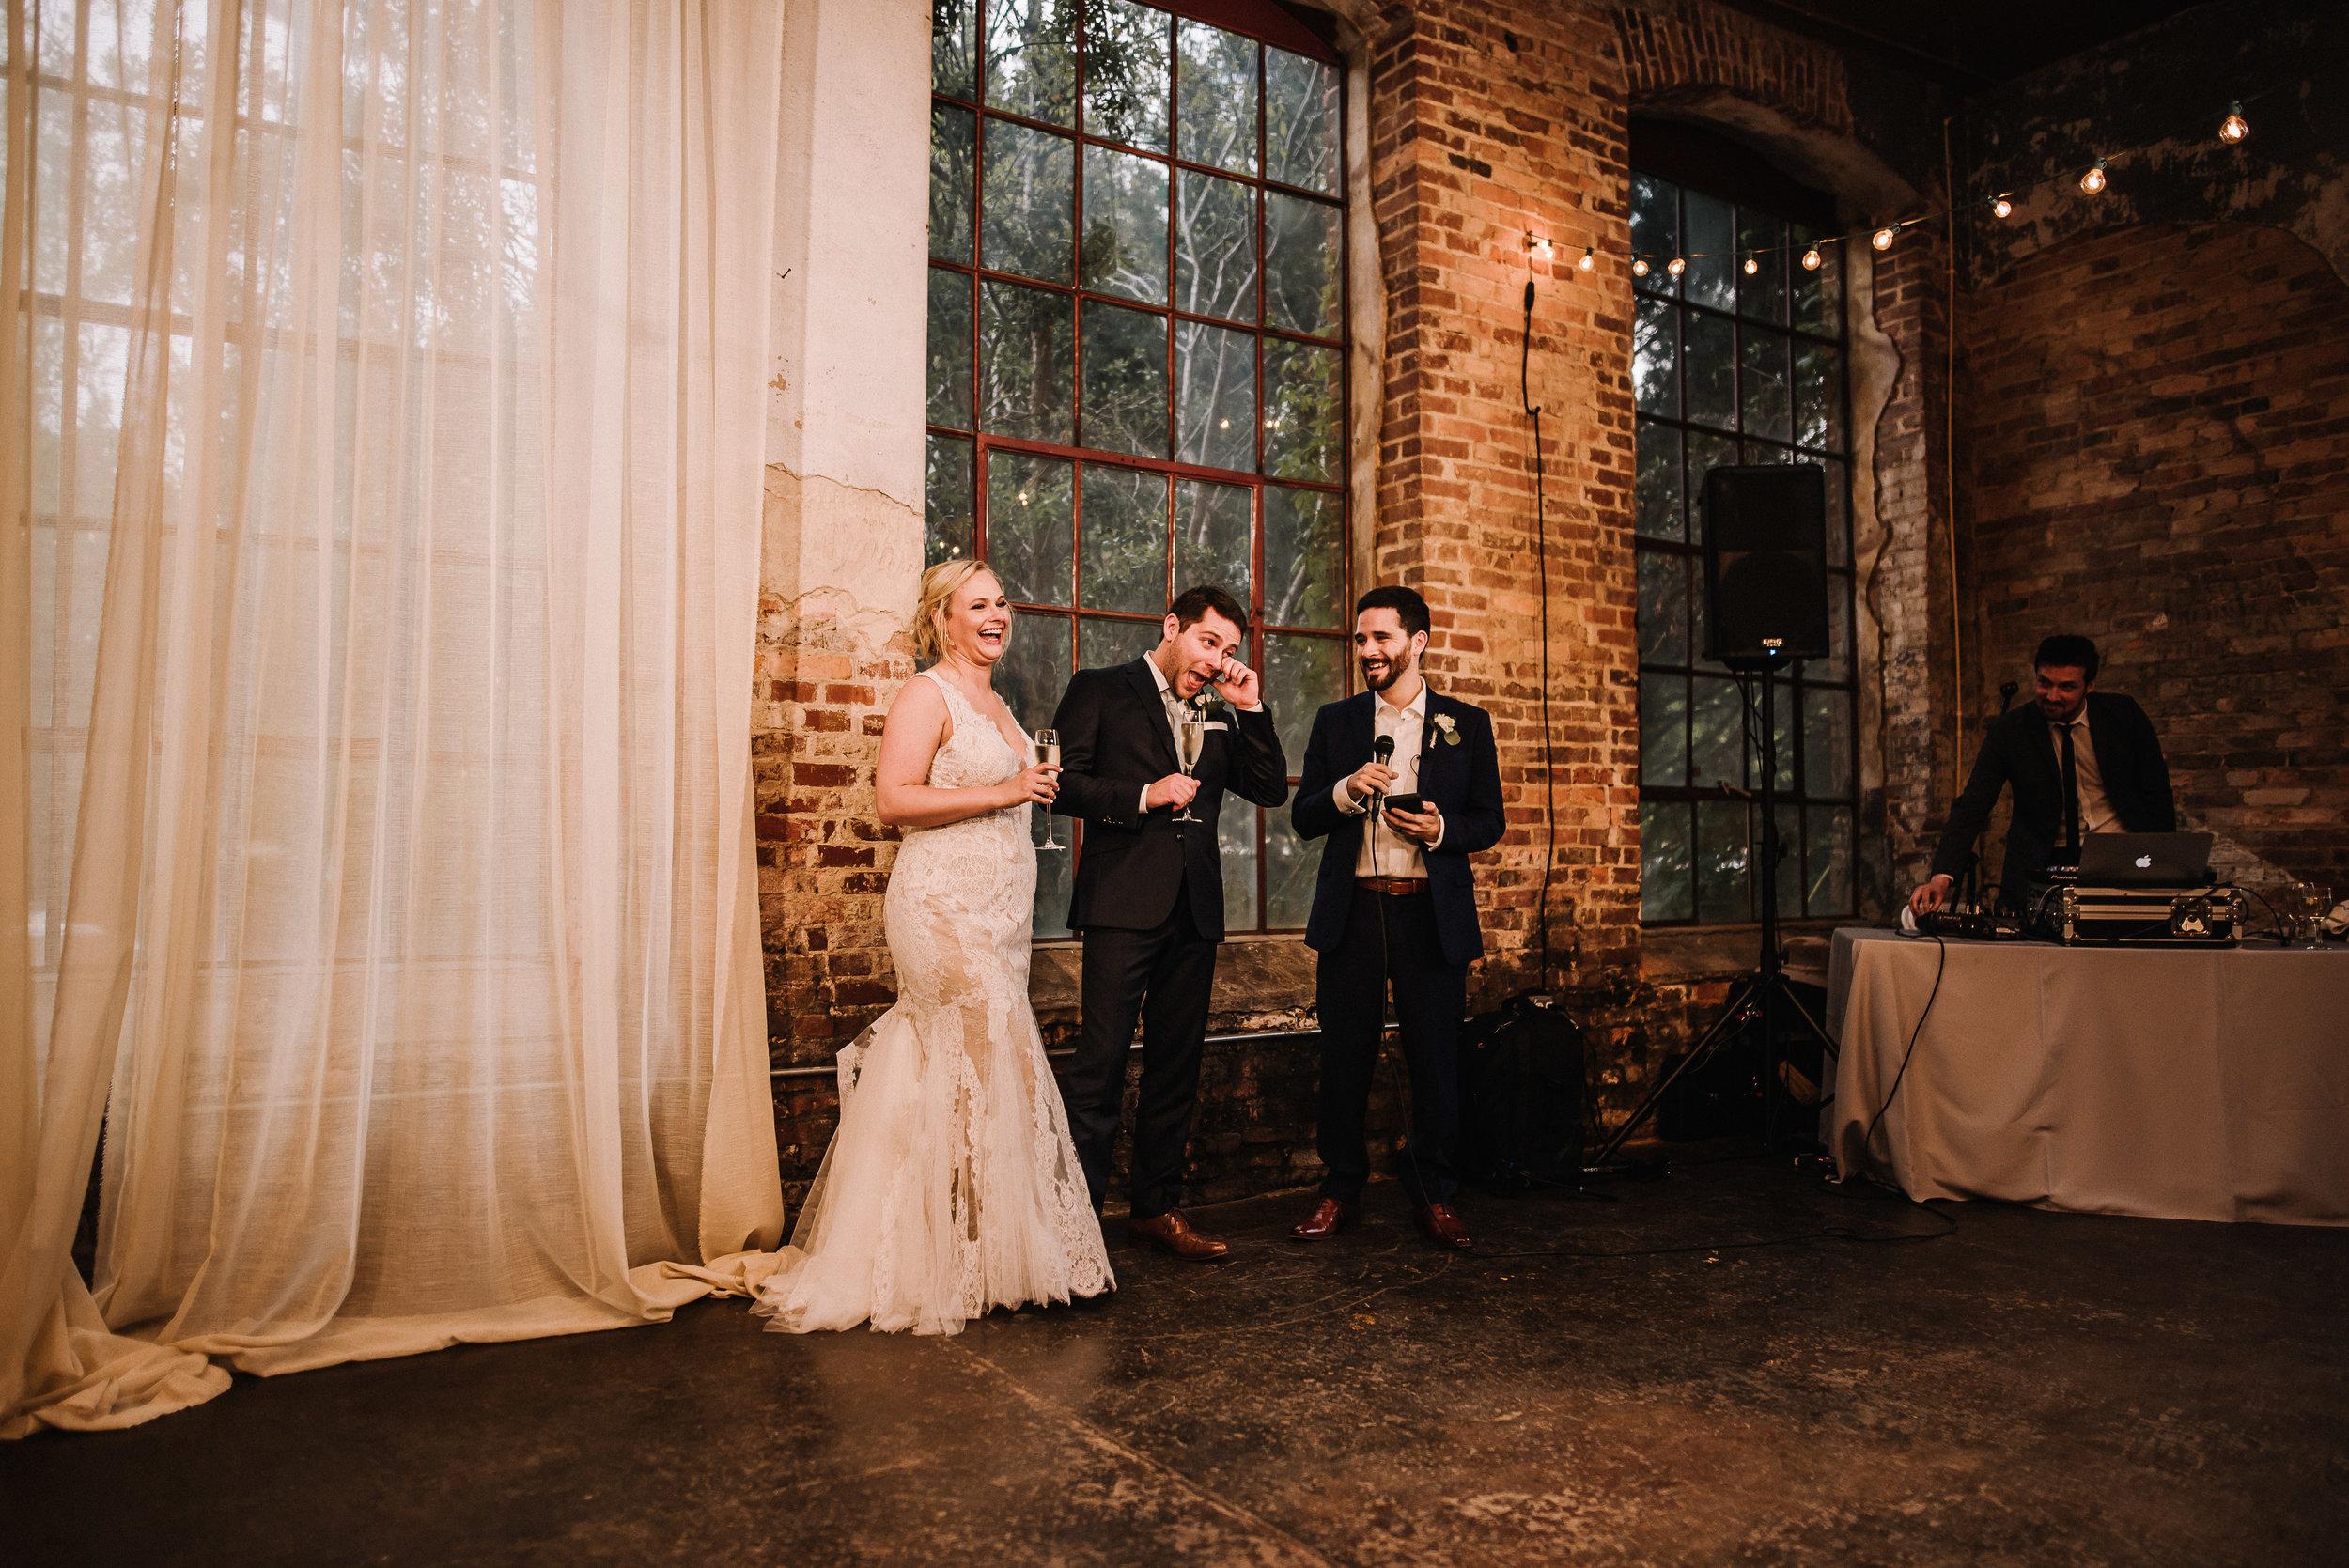 Morgan Wedding_Mill at Yellow River_Ashley Benham Photography-1056.jpg